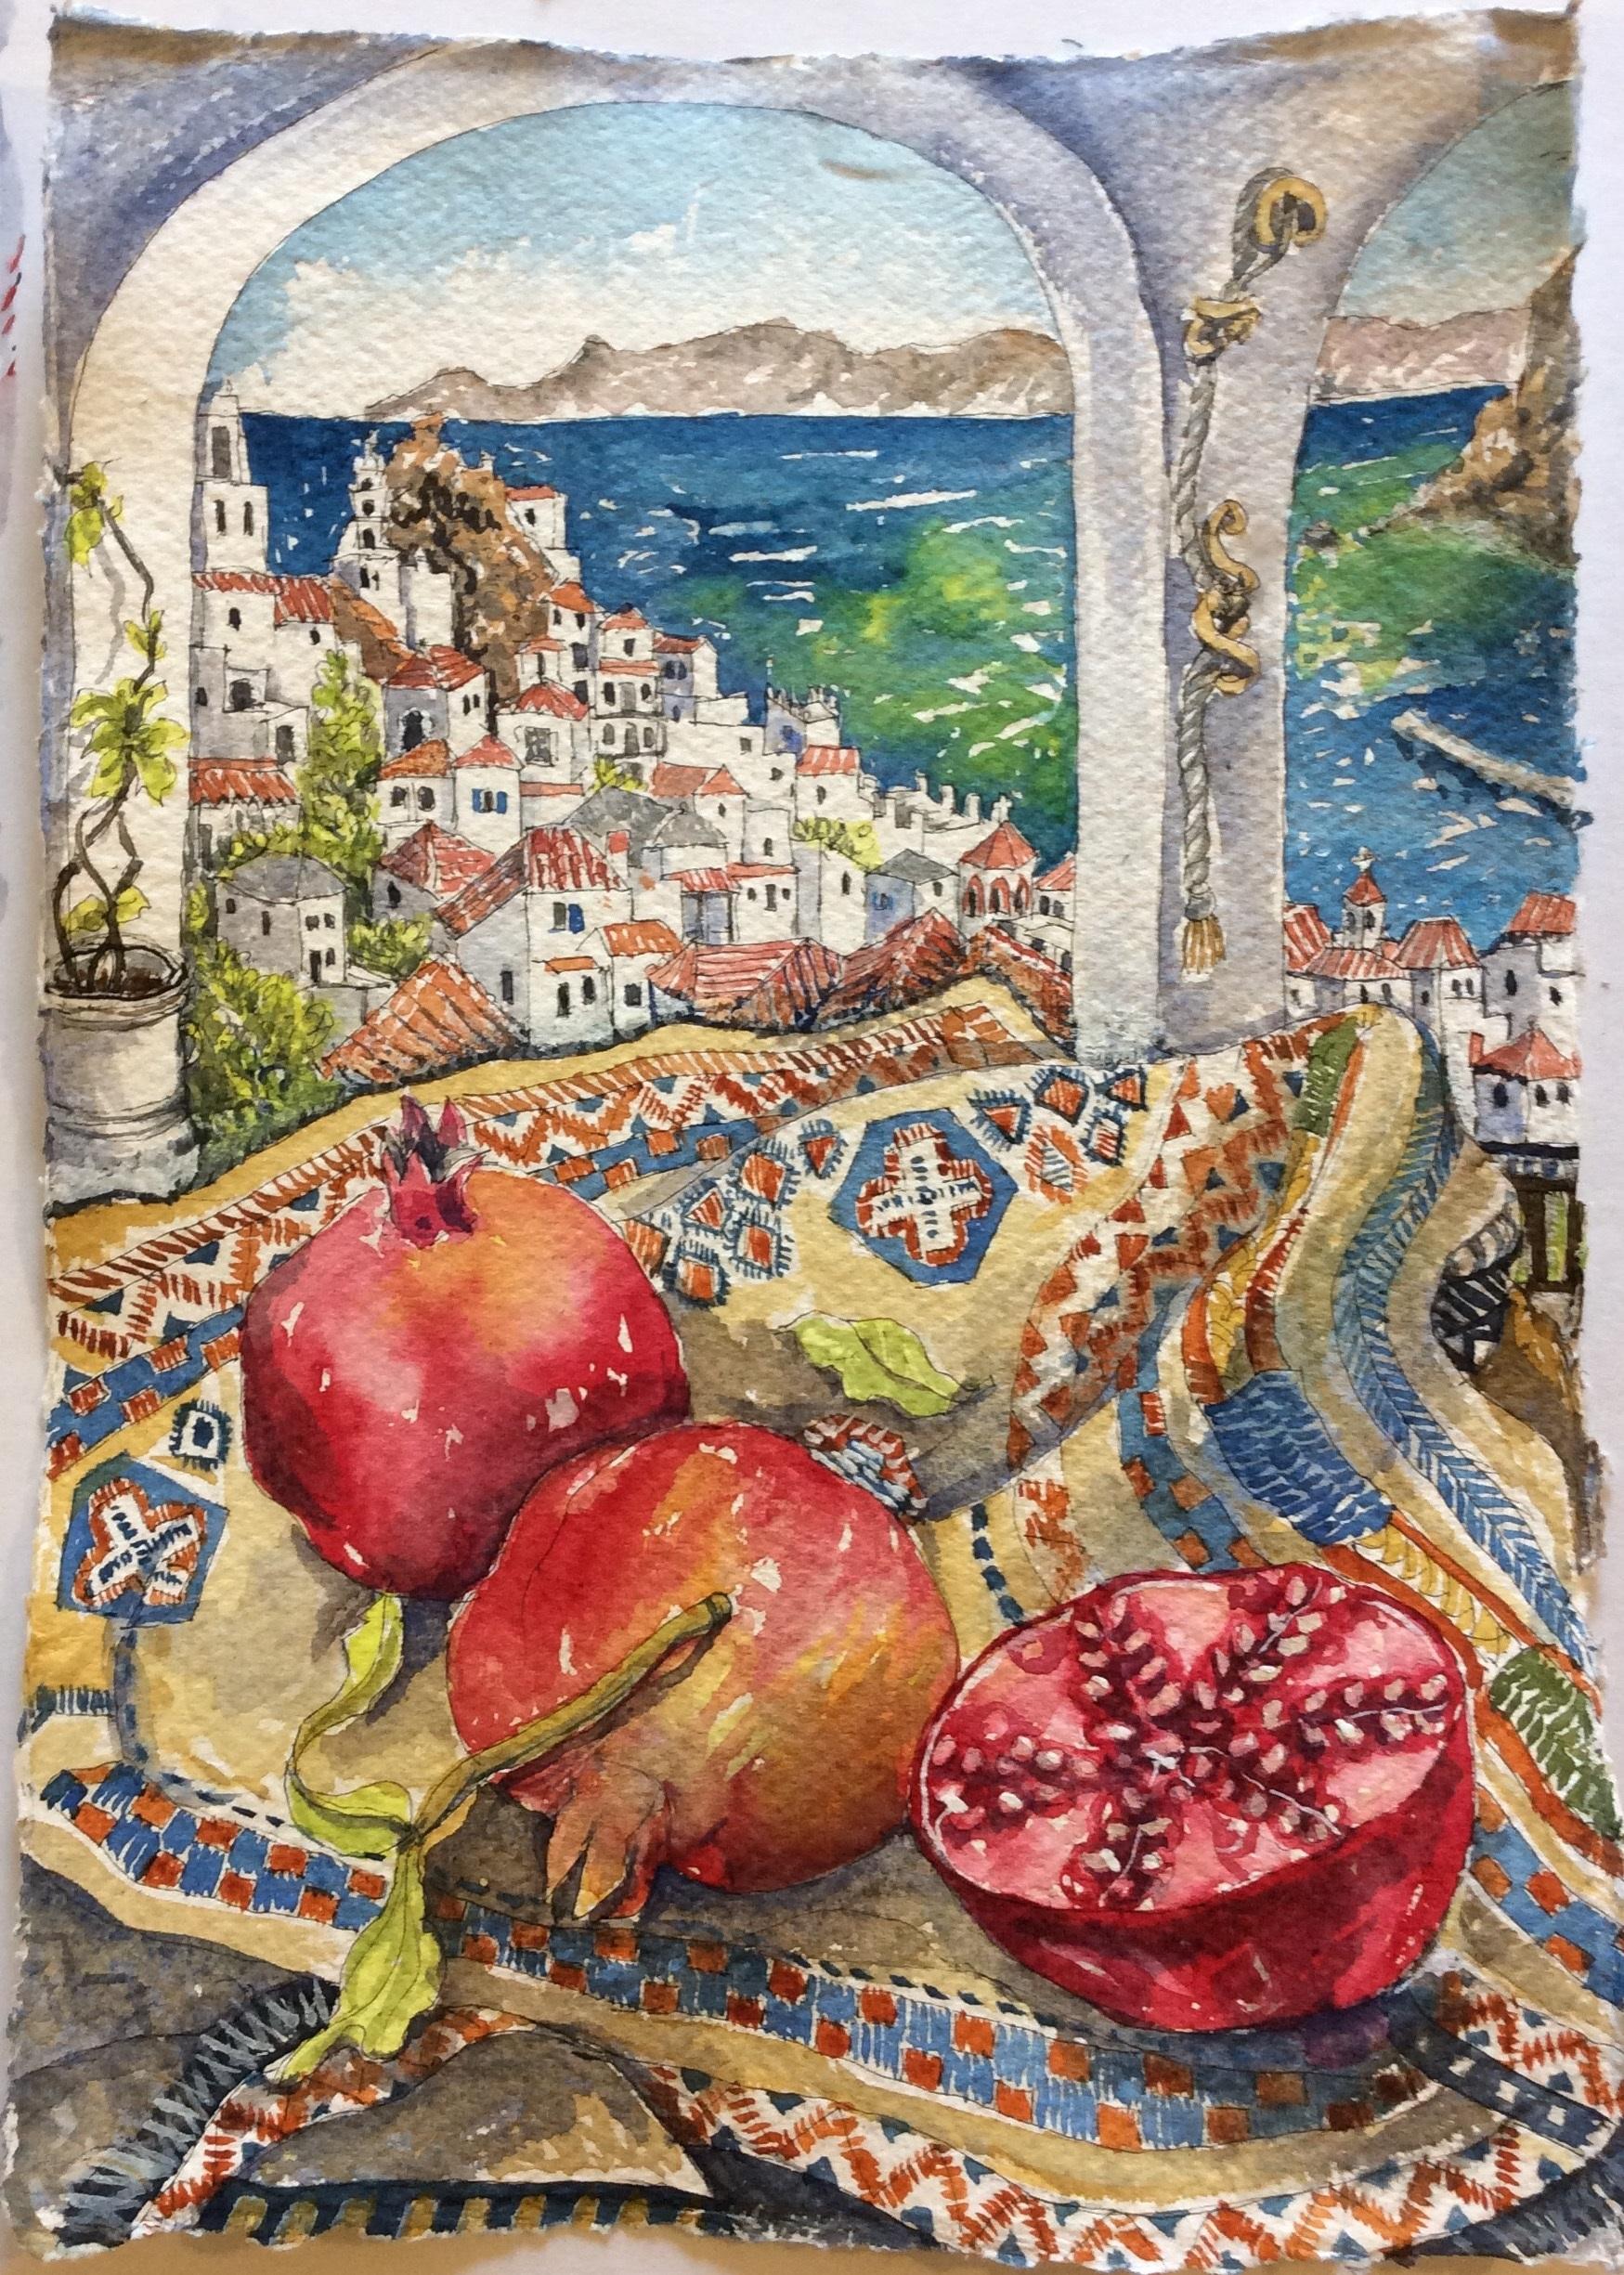 Pomegranates in Skopelos